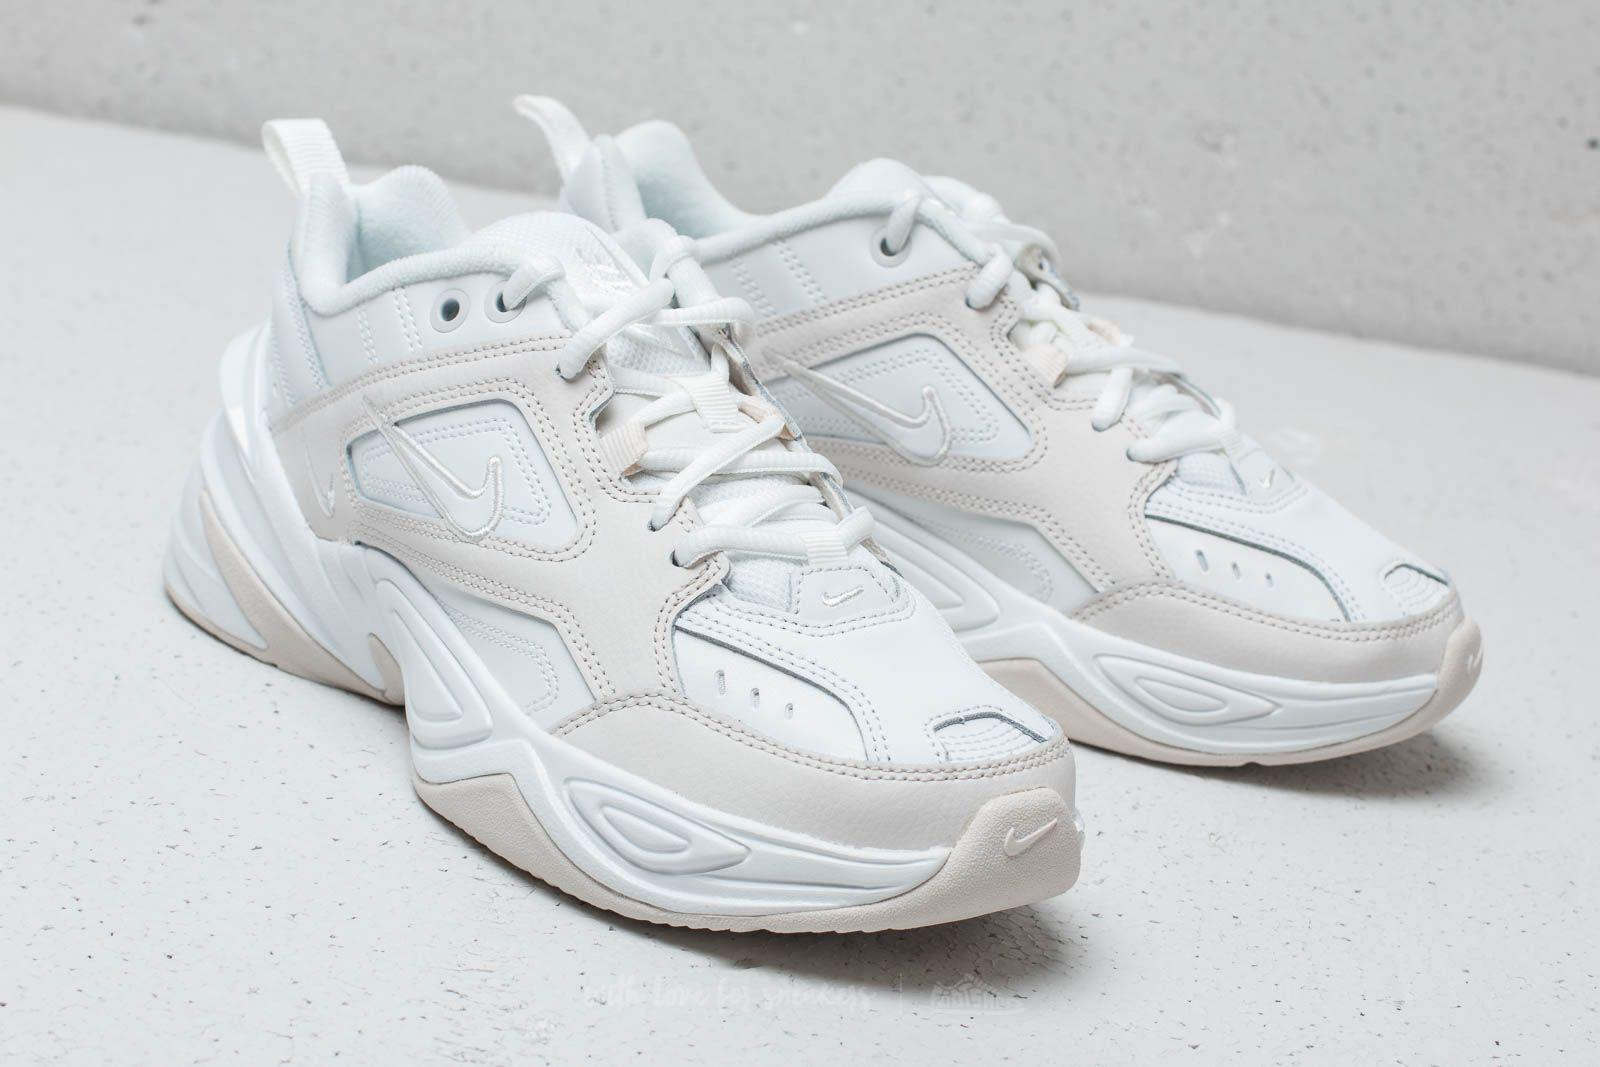 b218e52eb Nike M2k Tekno W Phantom  Summit White in White - Lyst